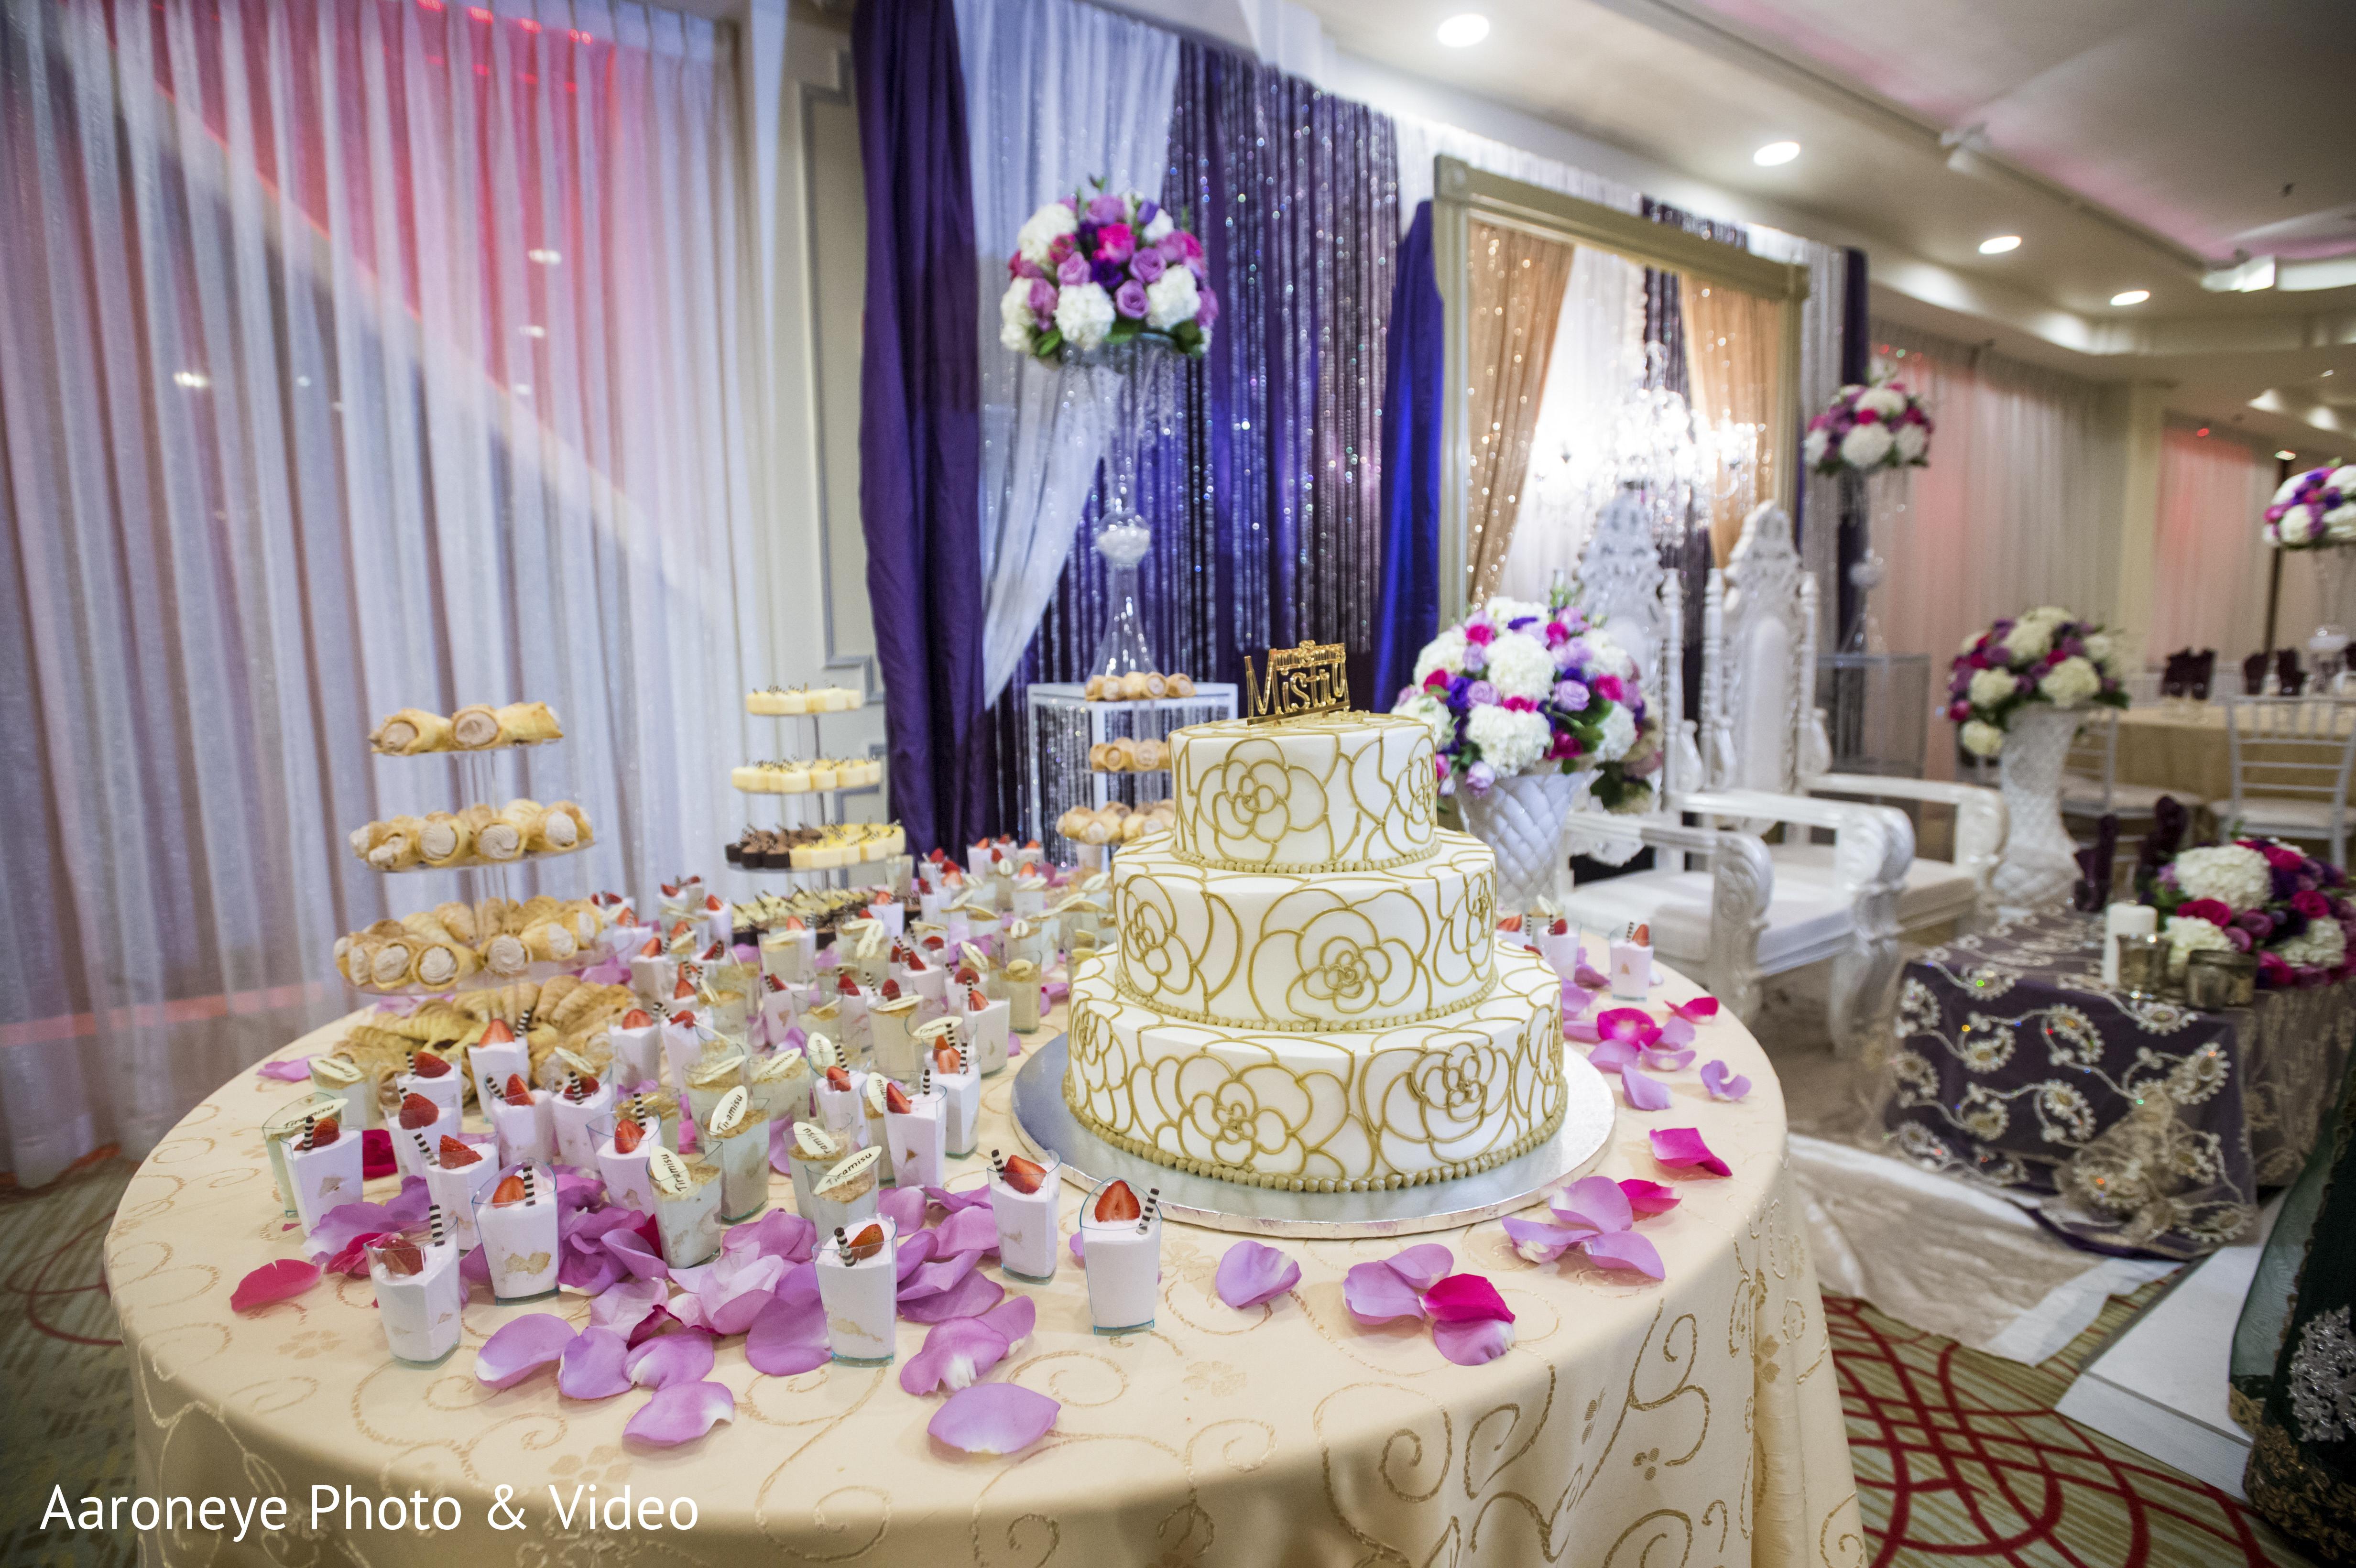 indian wedding cakeindian wedding cakeswedding cakewedding cakesindian wedding